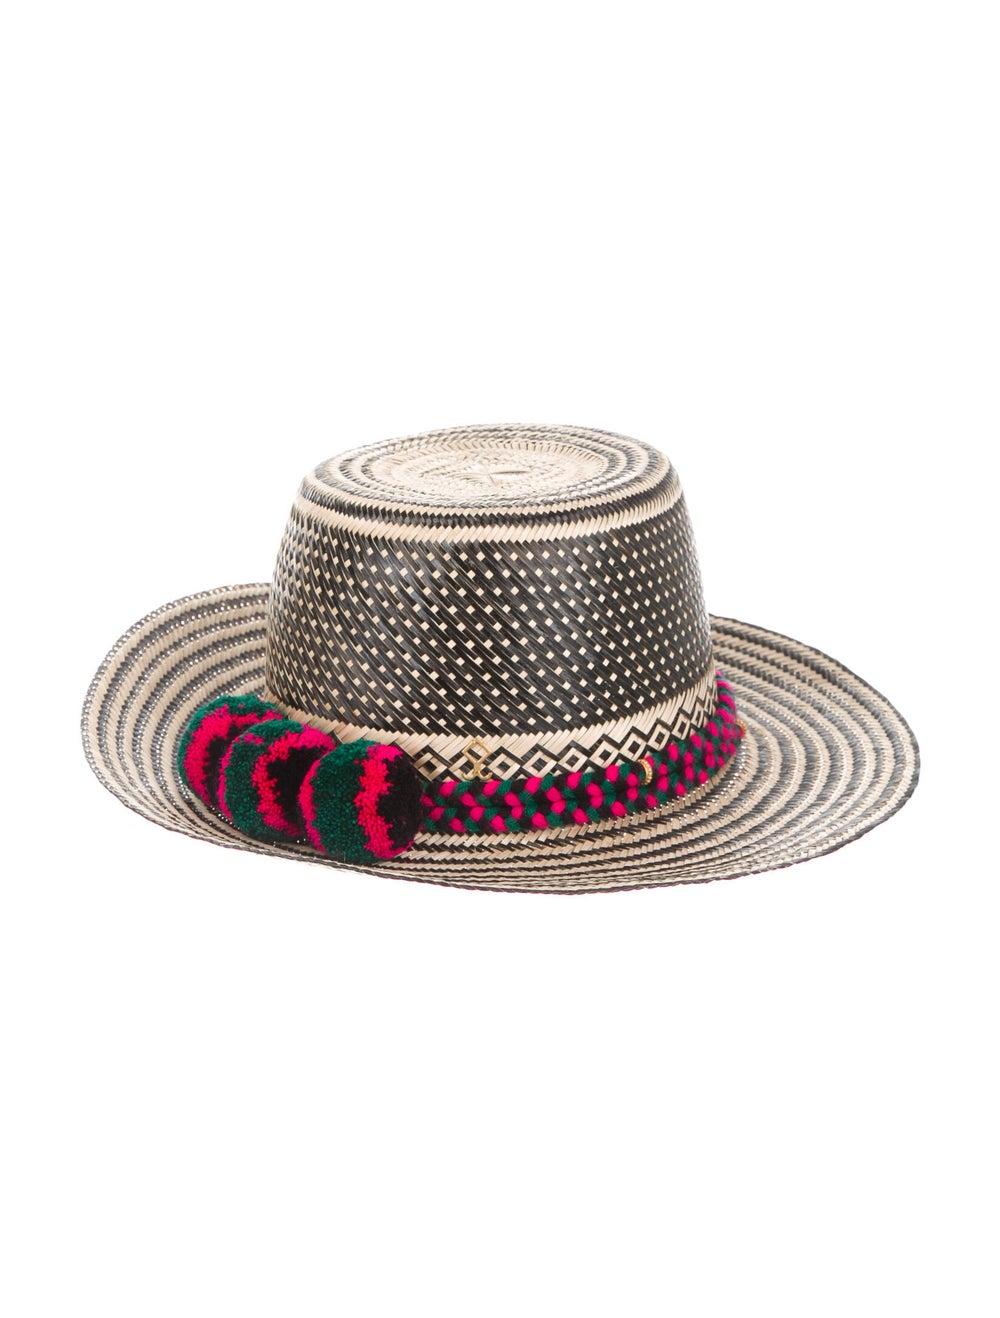 Yosuzi Straw Wide Brim Hat Tan - image 2